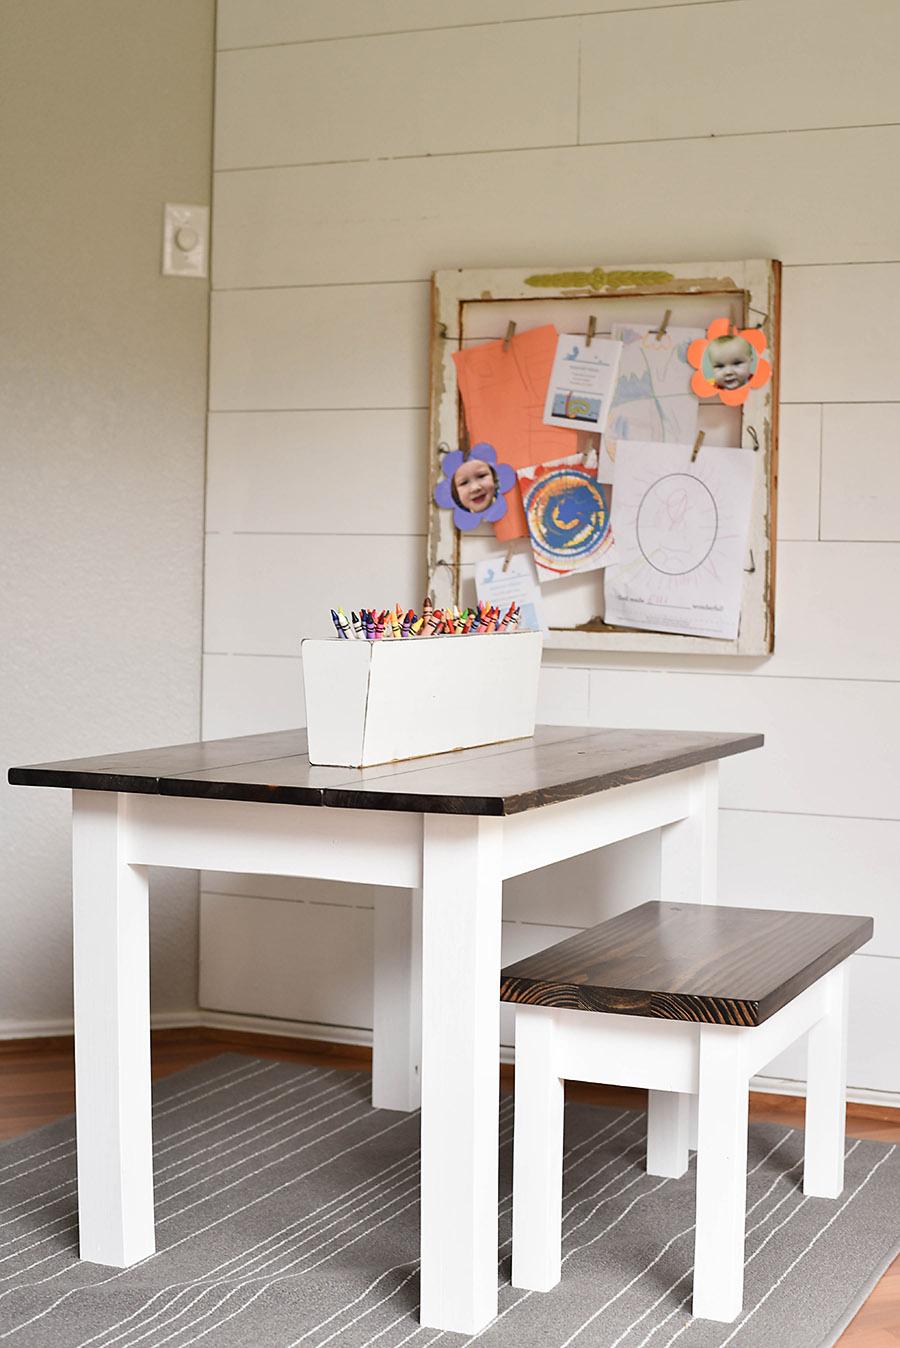 DIY Kidu0027s Farmhouse Table   Our Handcrafted Life